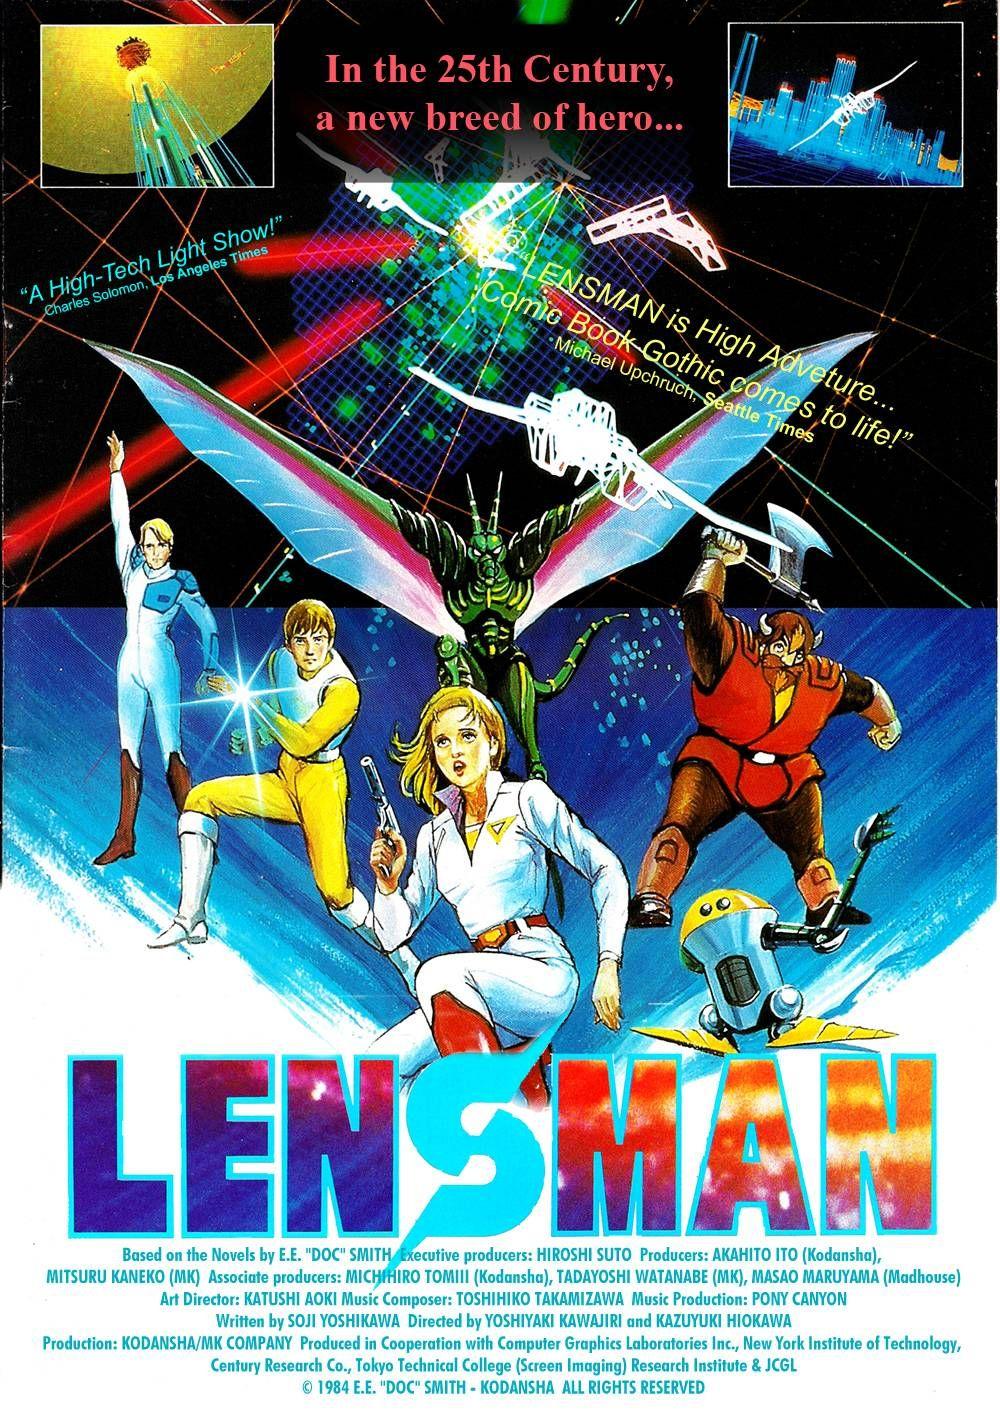 Lensman (1984) Madhouse MadhouseStudios anime